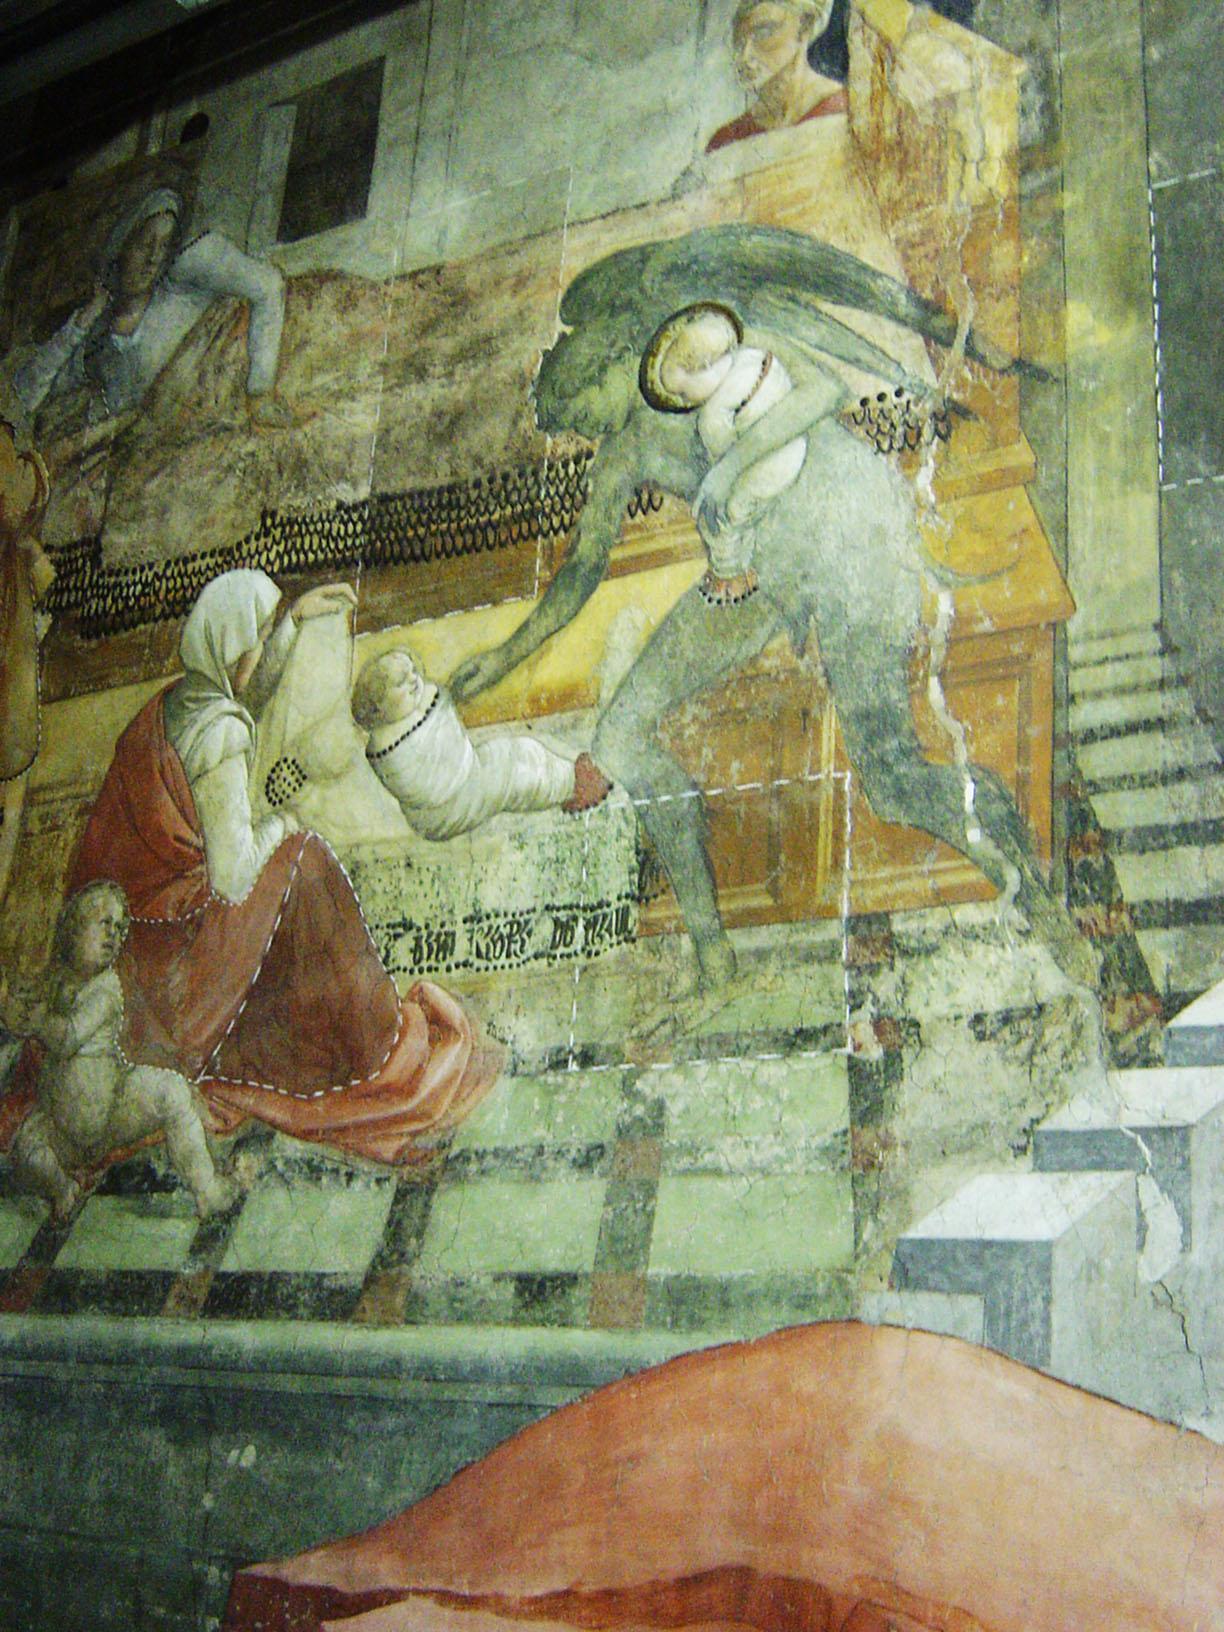 Prato, Duomo - Visit to restoratio of frescos of Filippo Lippi